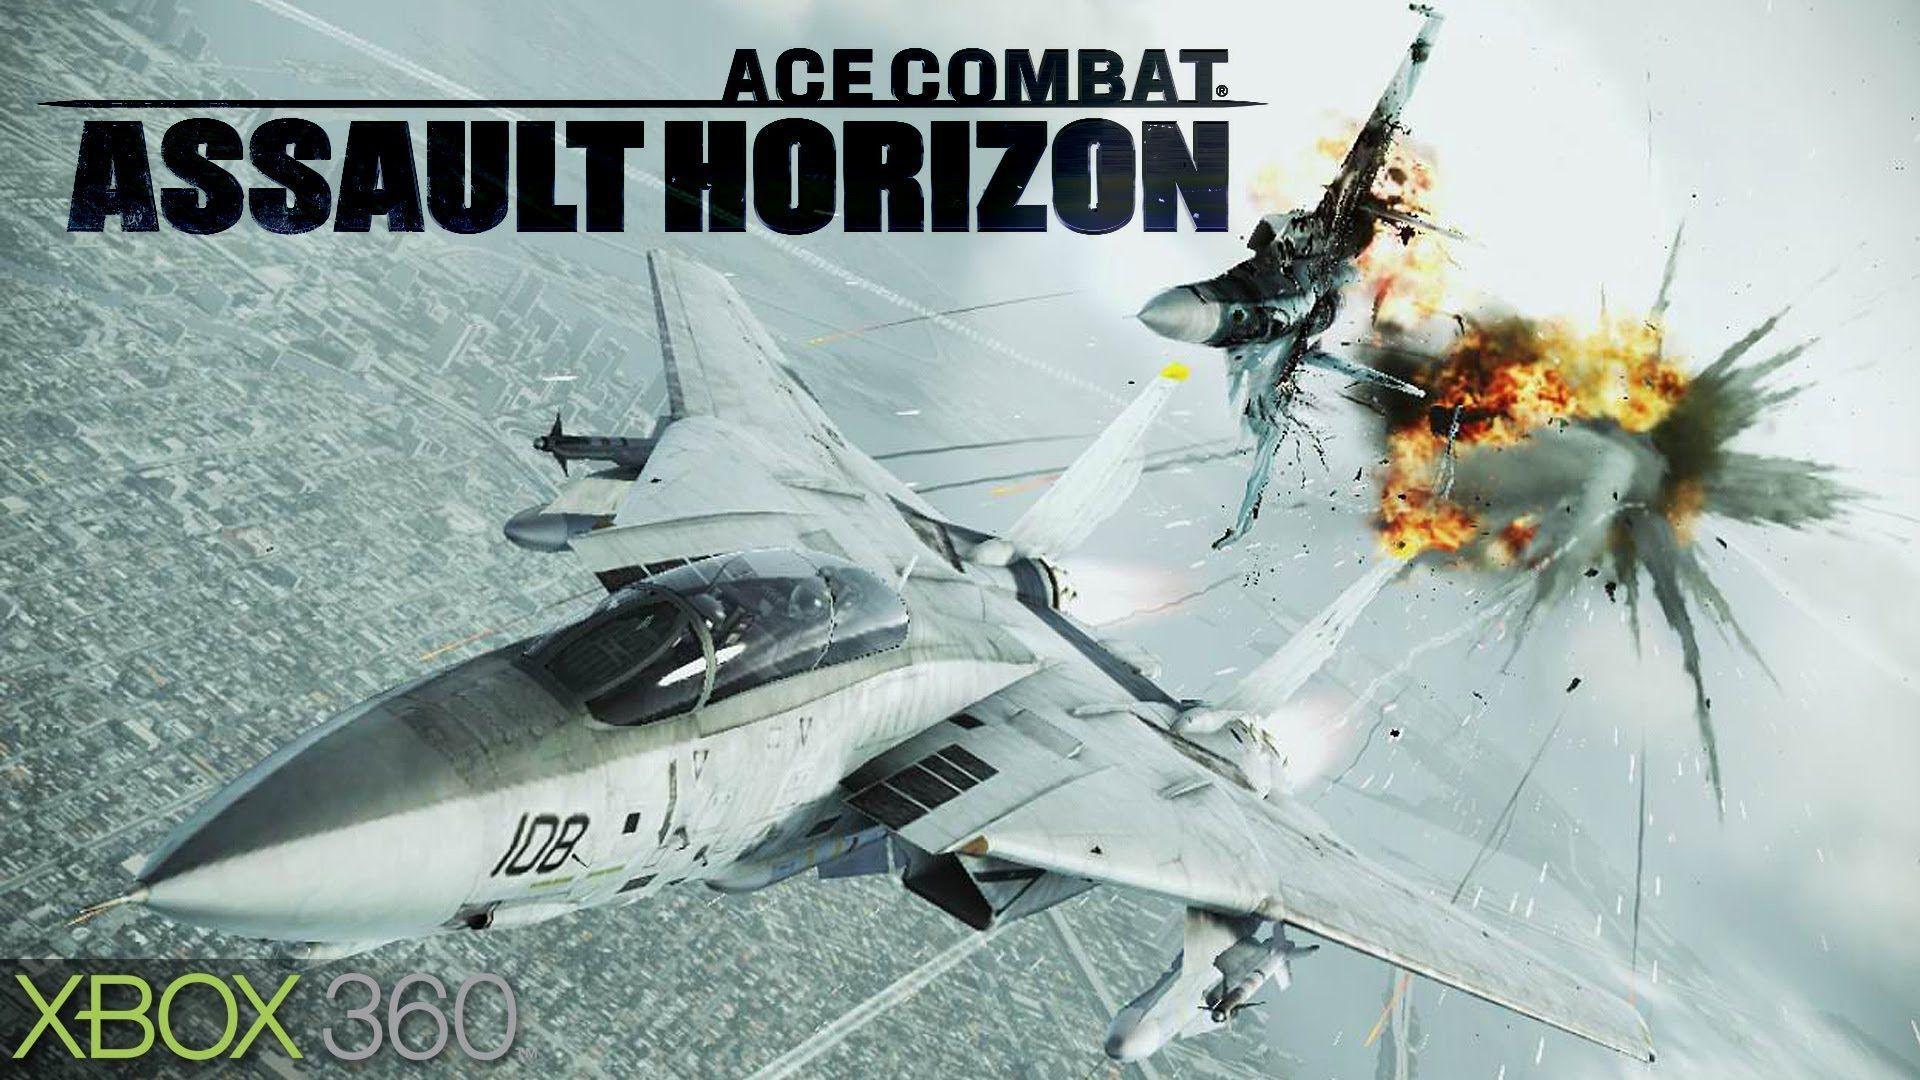 Ace Combat Assault Horizon Wallpaper Hd Wallpaper Cave